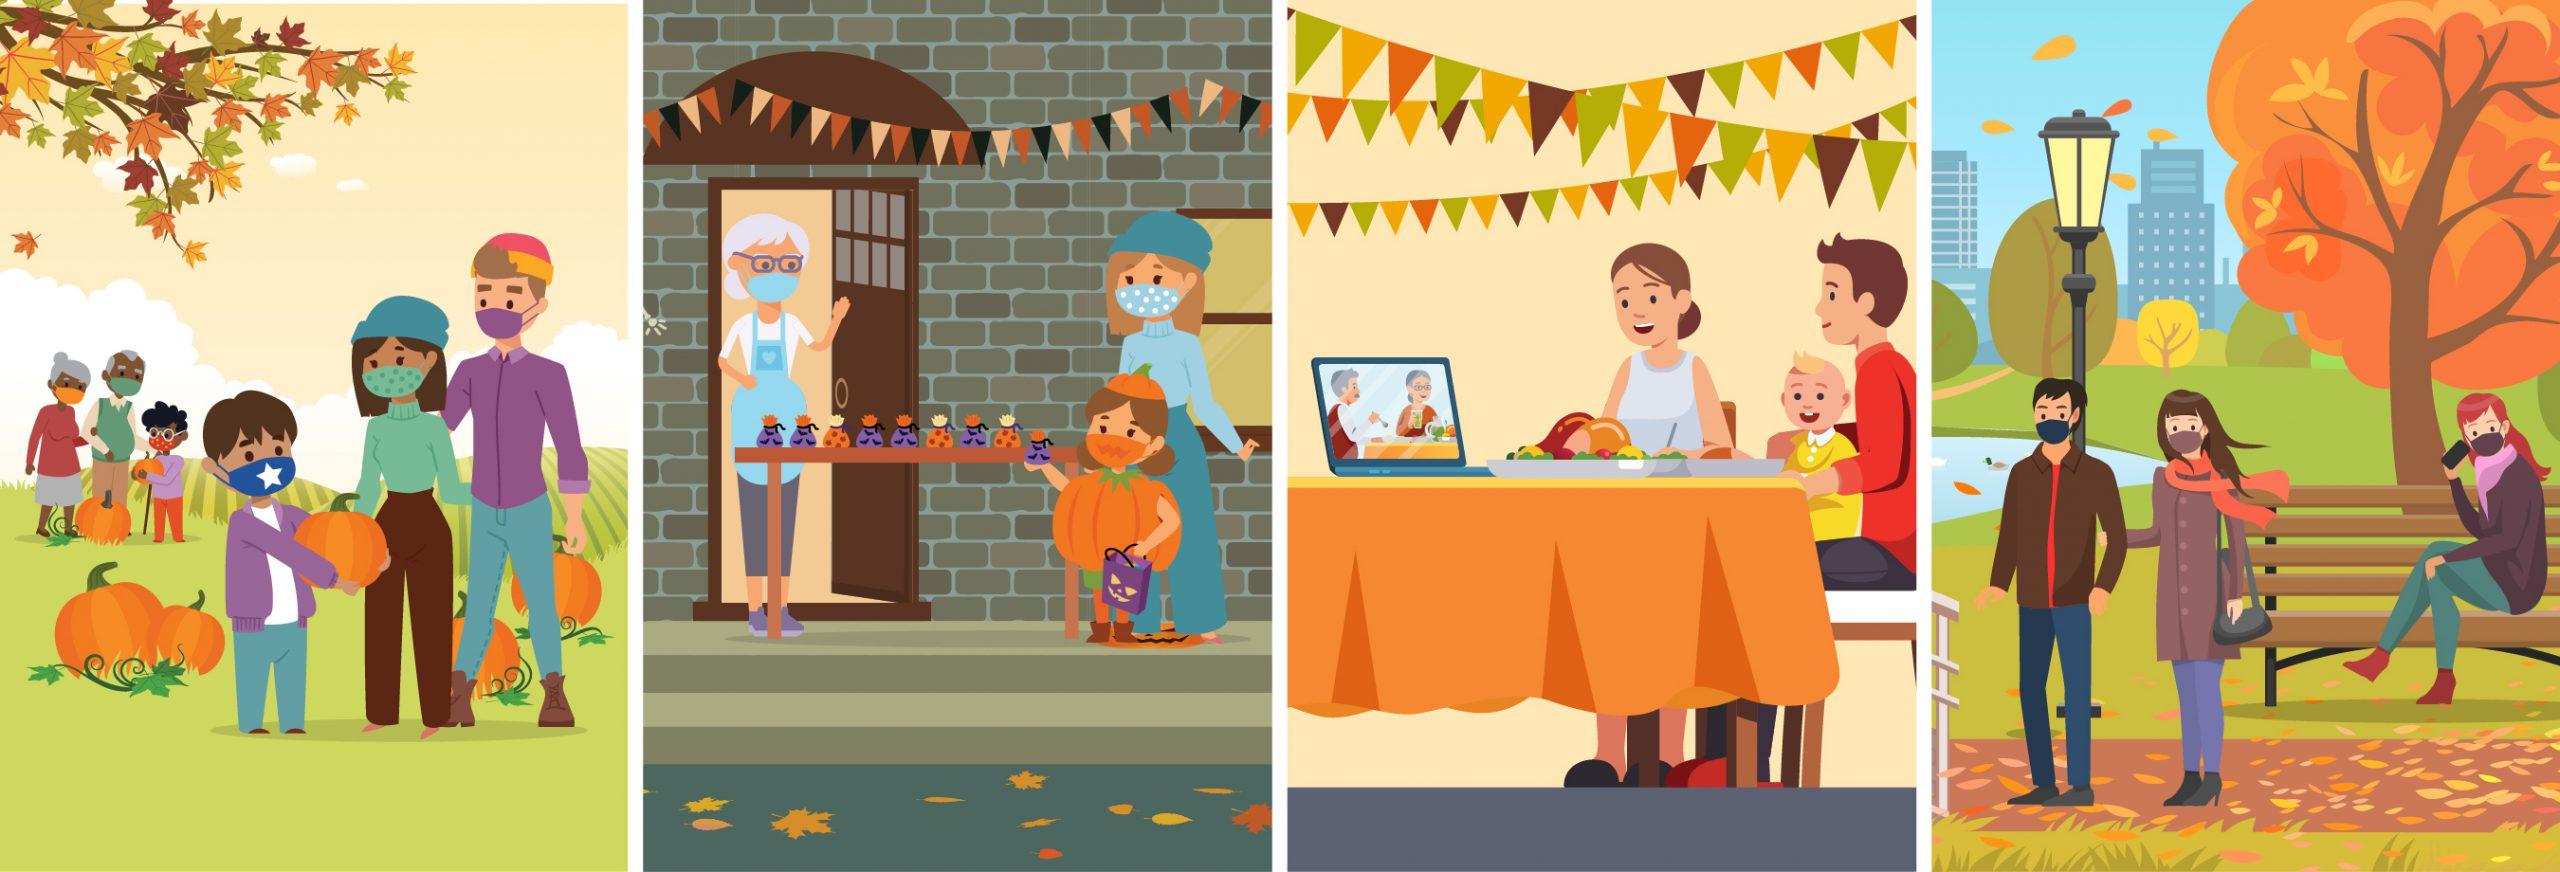 illustration of families celebrating fall festivities